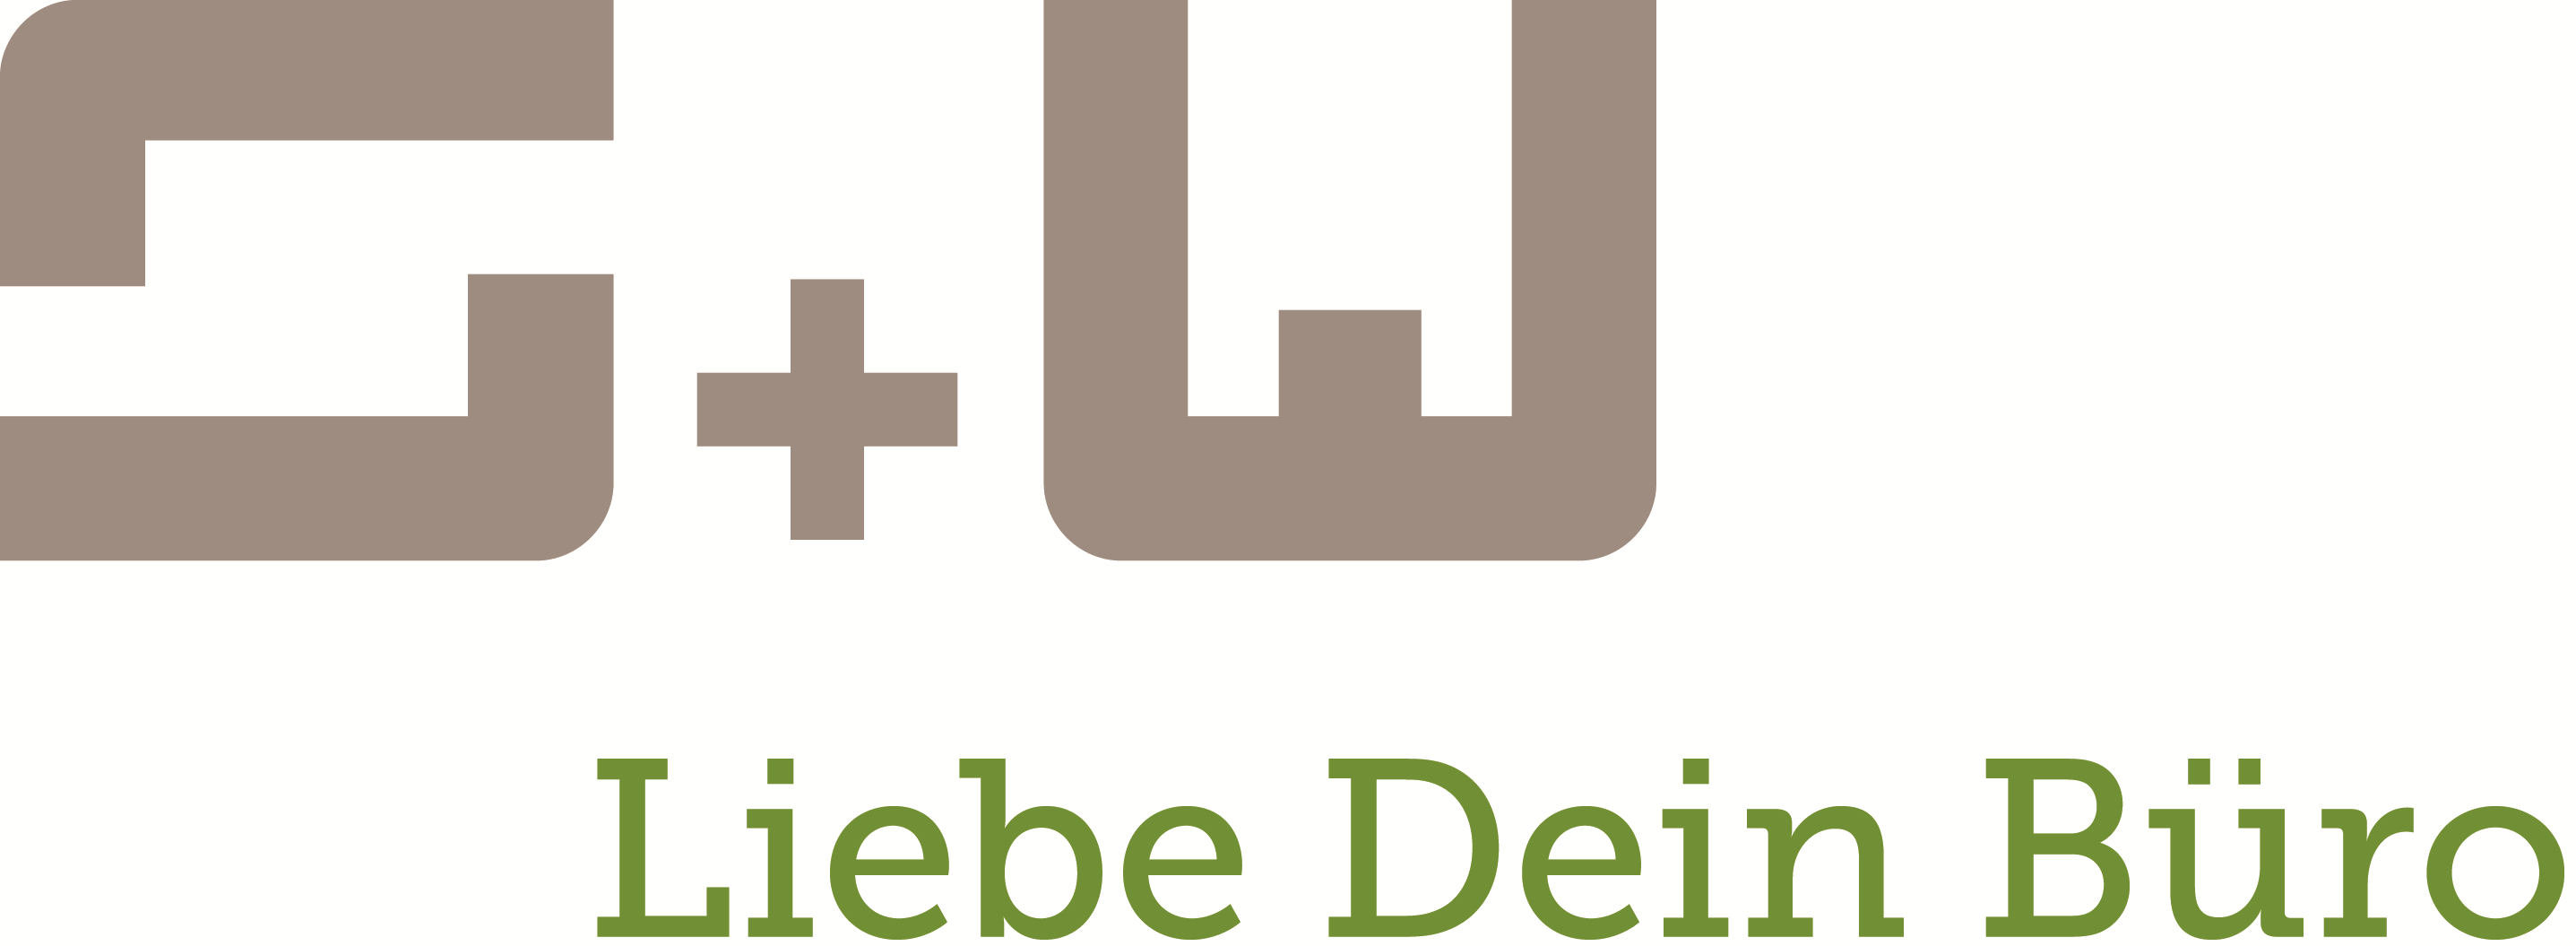 Büromöbel & Büroeinrichtung in München - S+W BüroRaumKultur GmbH